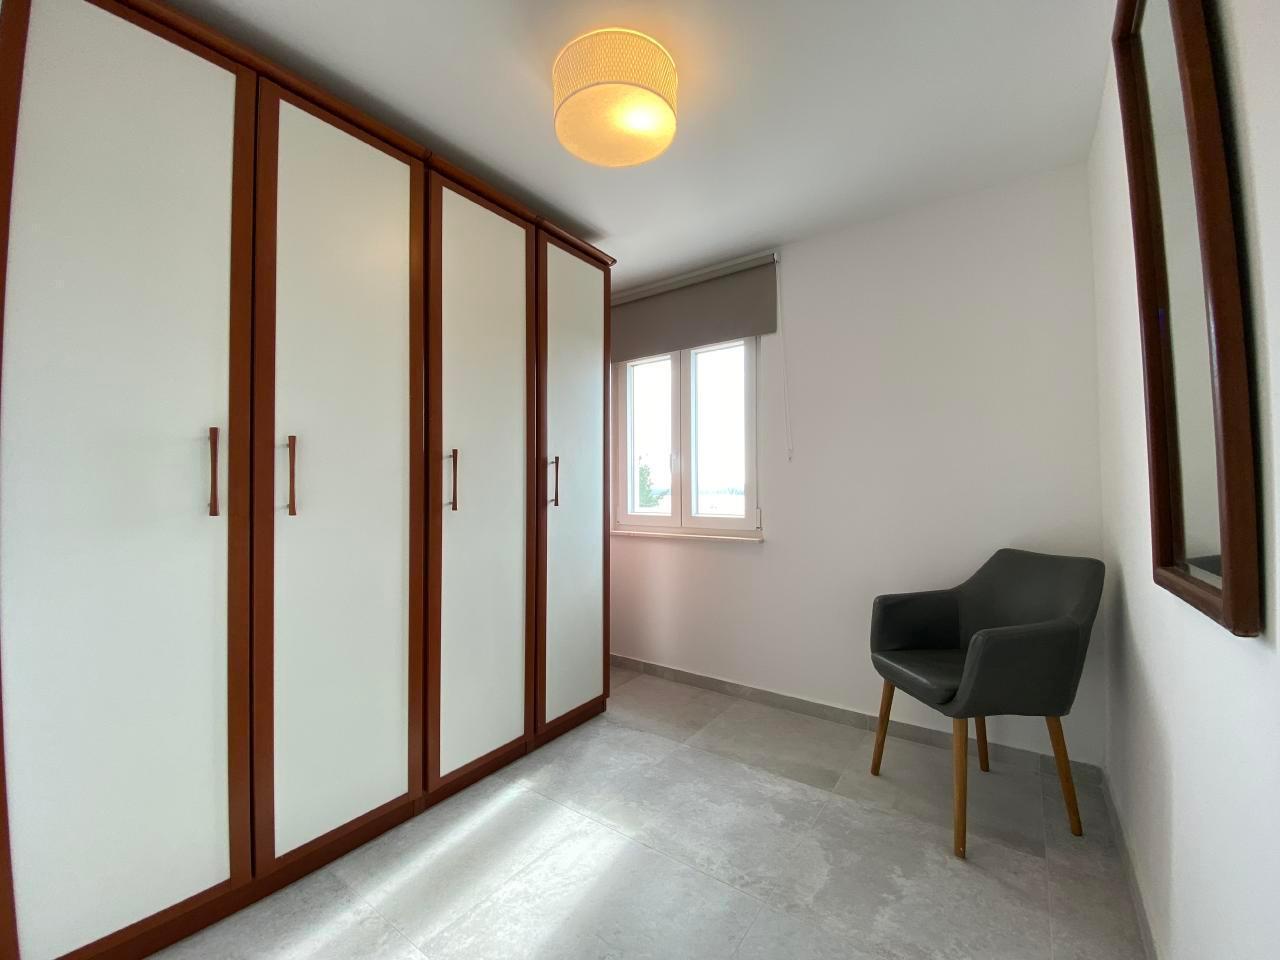 Ferienwohnung Casa Anica Apartment Bellevue (656993), Kuciste, Insel Peljesac, Dalmatien, Kroatien, Bild 9